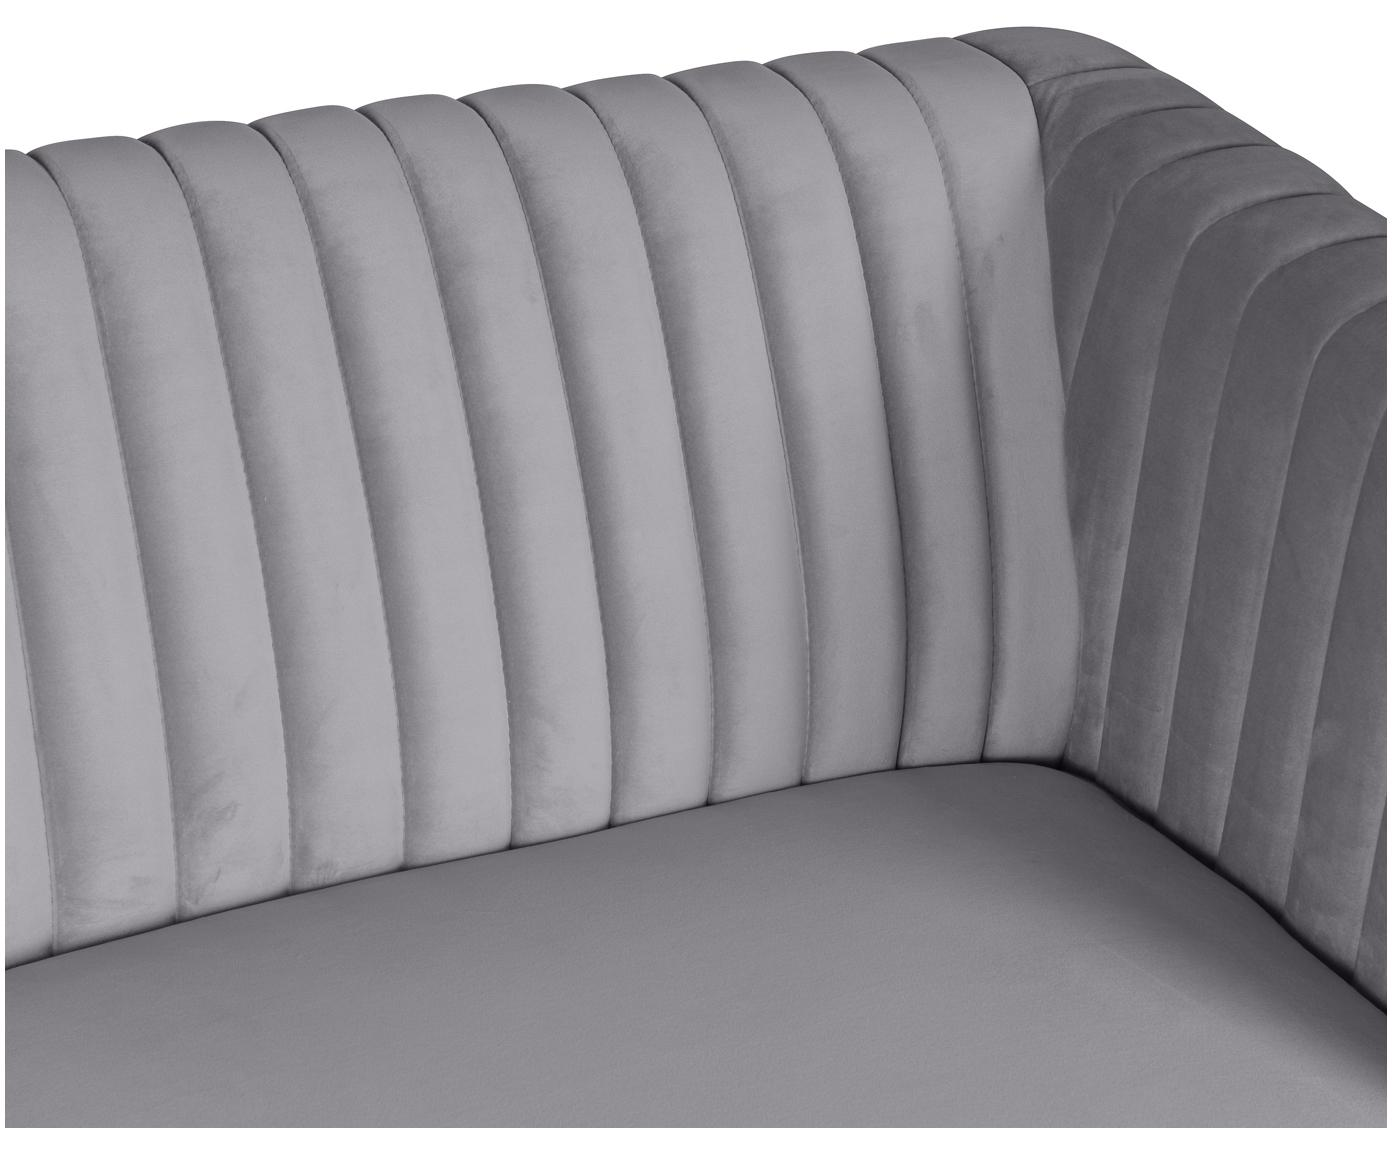 Fluwelen bank Dante (2-zits), Bekleding: polyester fluweel, Poten: gelakt rubberhout, Bekleding: donkergrijs. Poten: rubberhoutkleurig, B 174  x D 87 cm